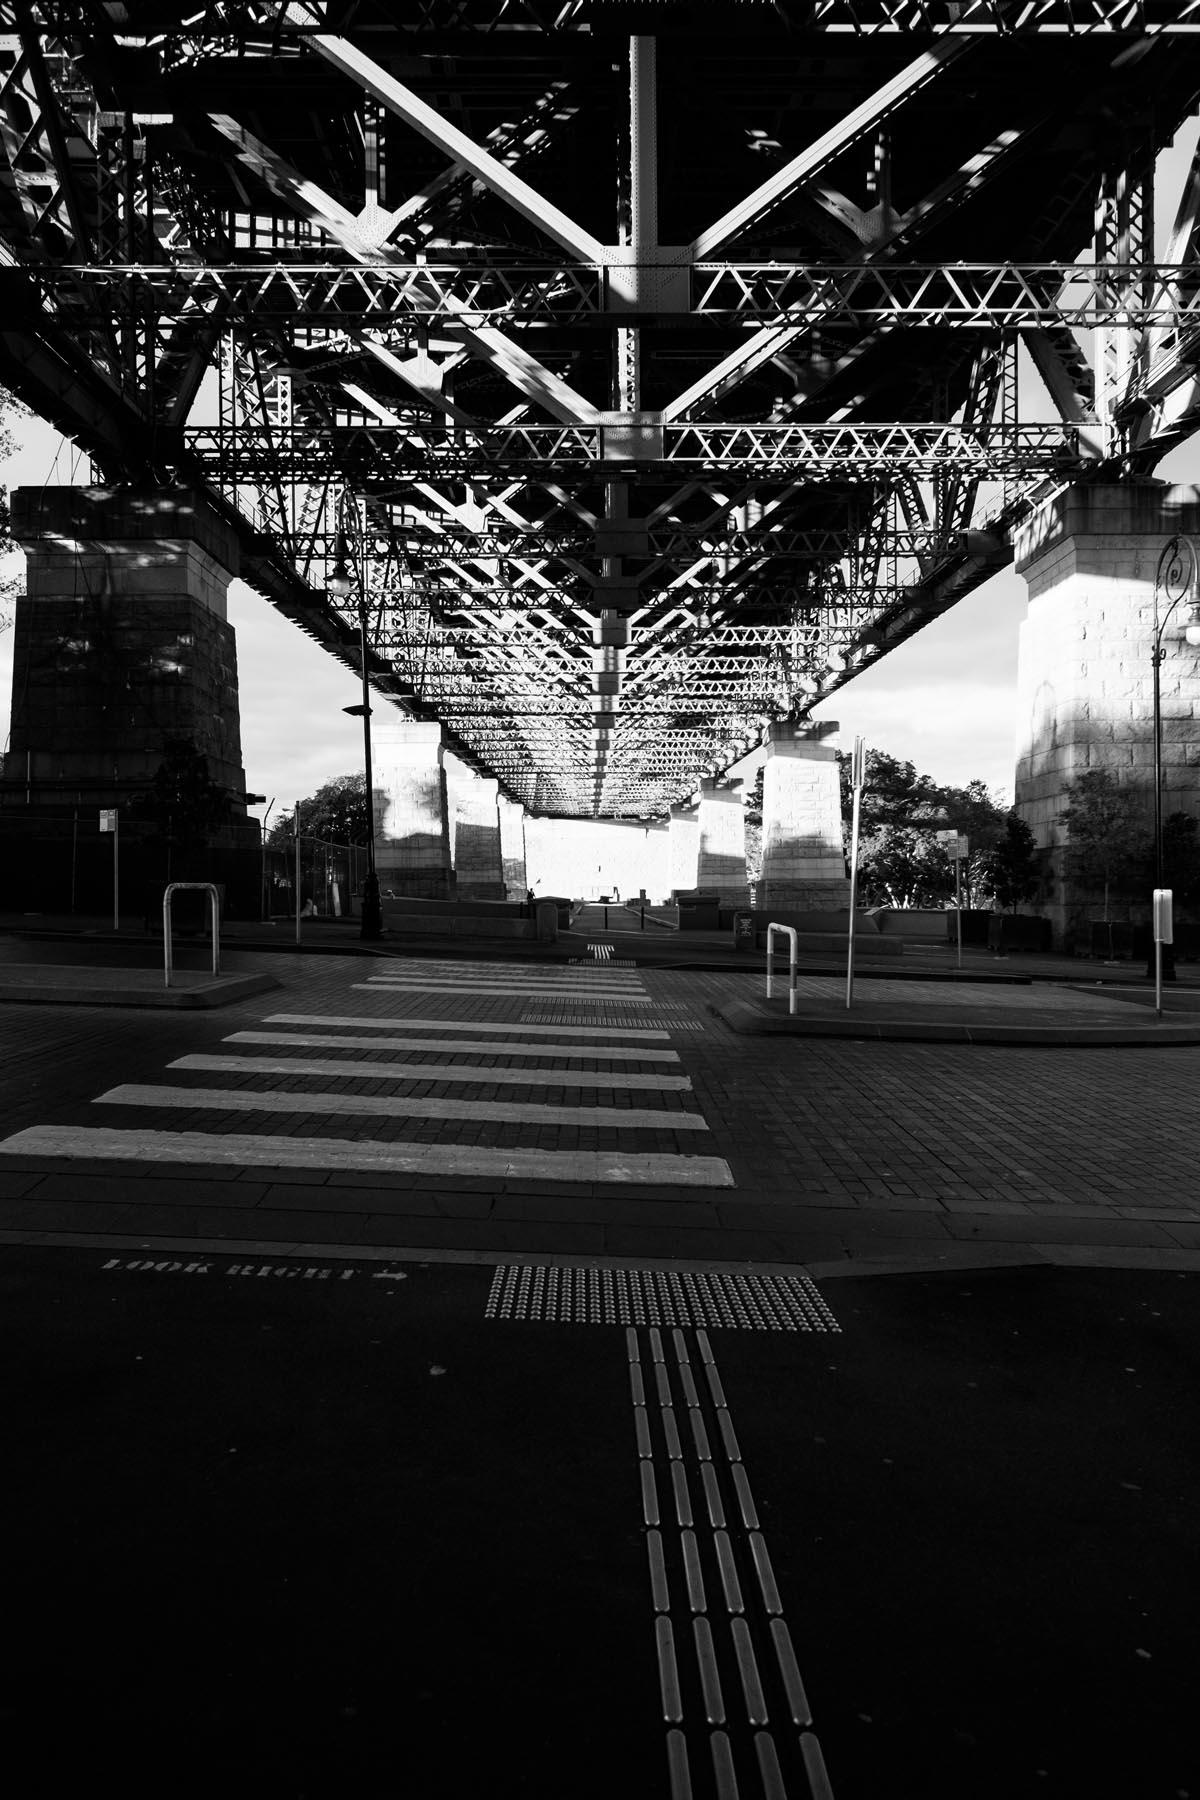 under the bridge sydney Australia